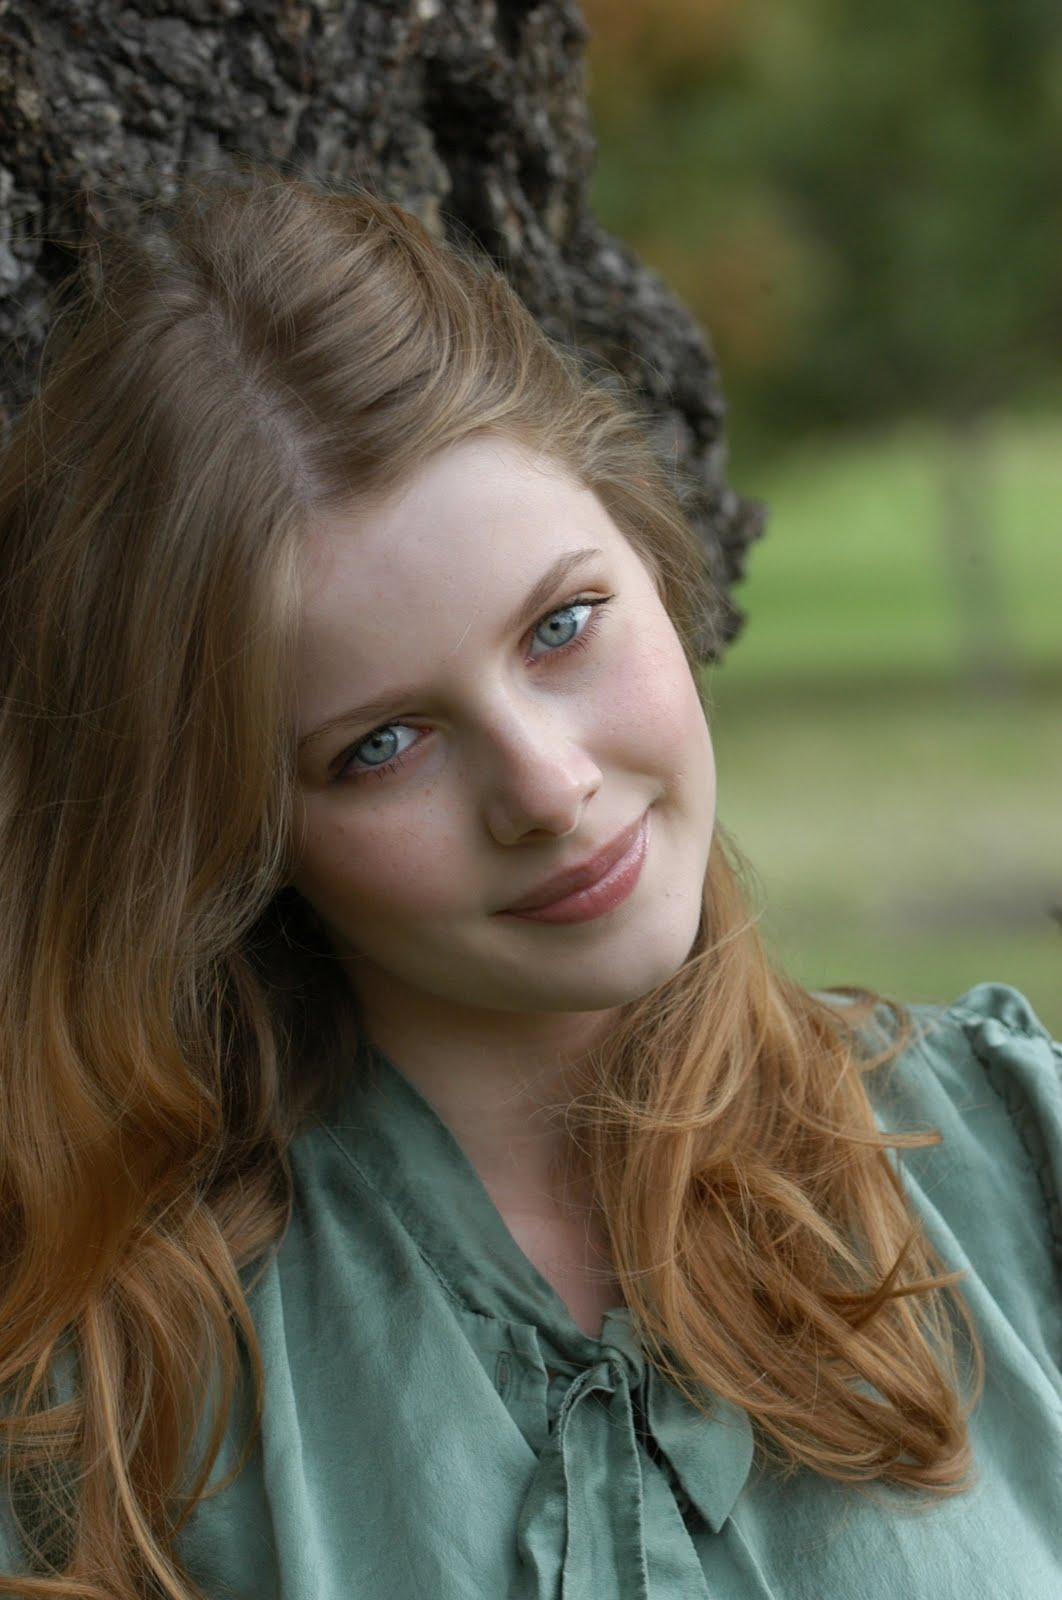 http://3.bp.blogspot.com/-nN_s8fwI5ck/TgEN_ItXGyI/AAAAAAAAEU8/-UsLo7kco7o/s1600/Rachel-hurd-wood-Hairstyles%2B%25289%2529.jpg